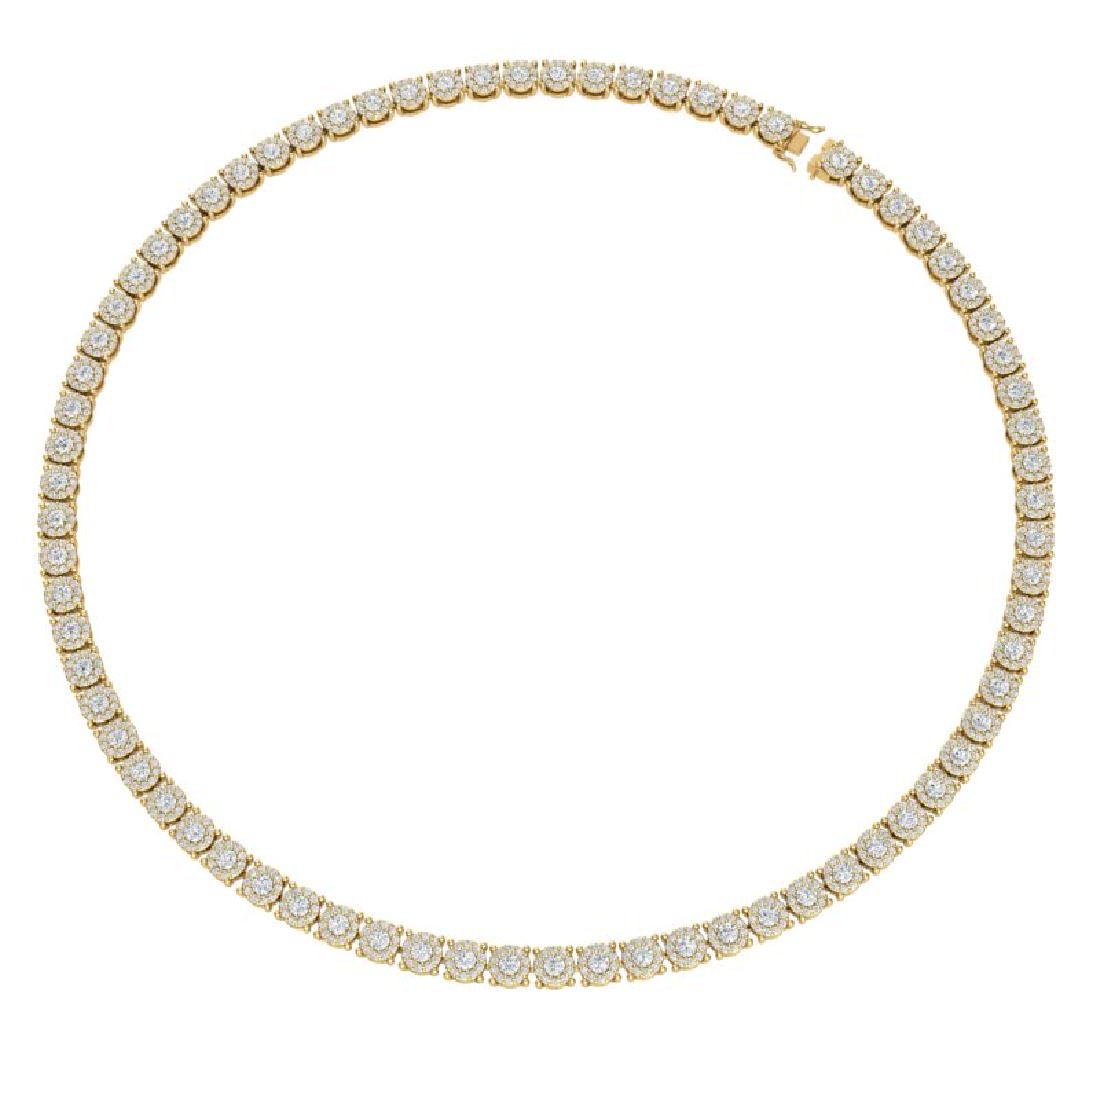 12 CTW Certified SI/I Diamond Halo Necklace 18K Yellow - 3